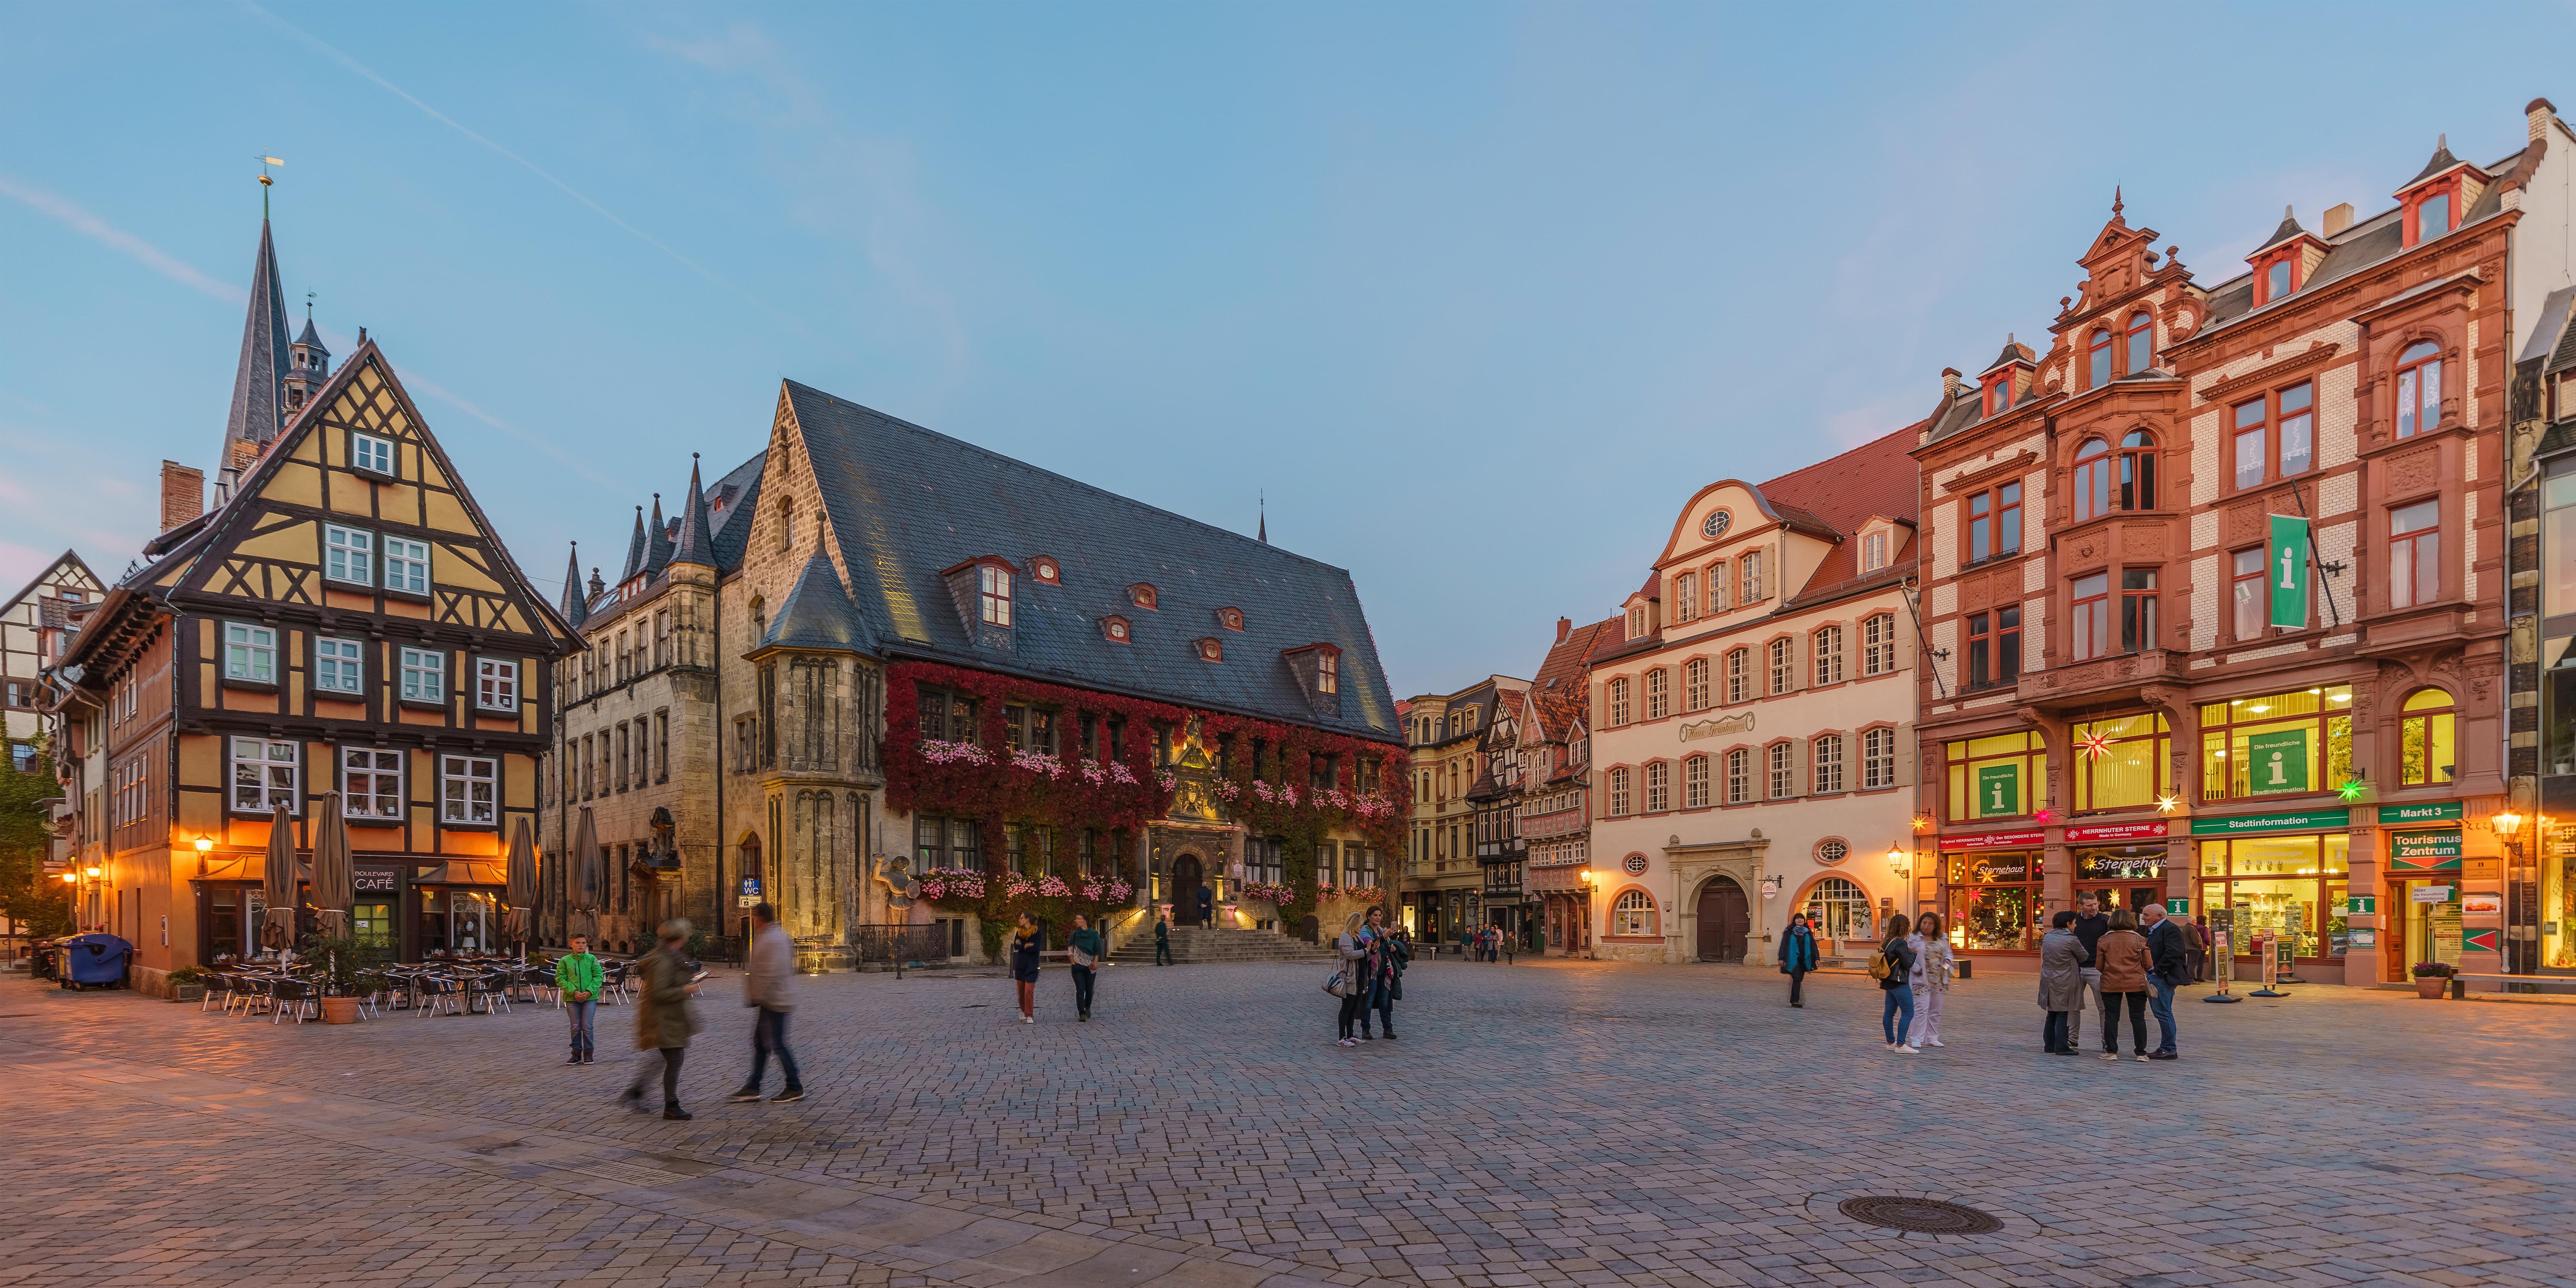 Quedlinburg asv2018-10 img11 Markt.jpg